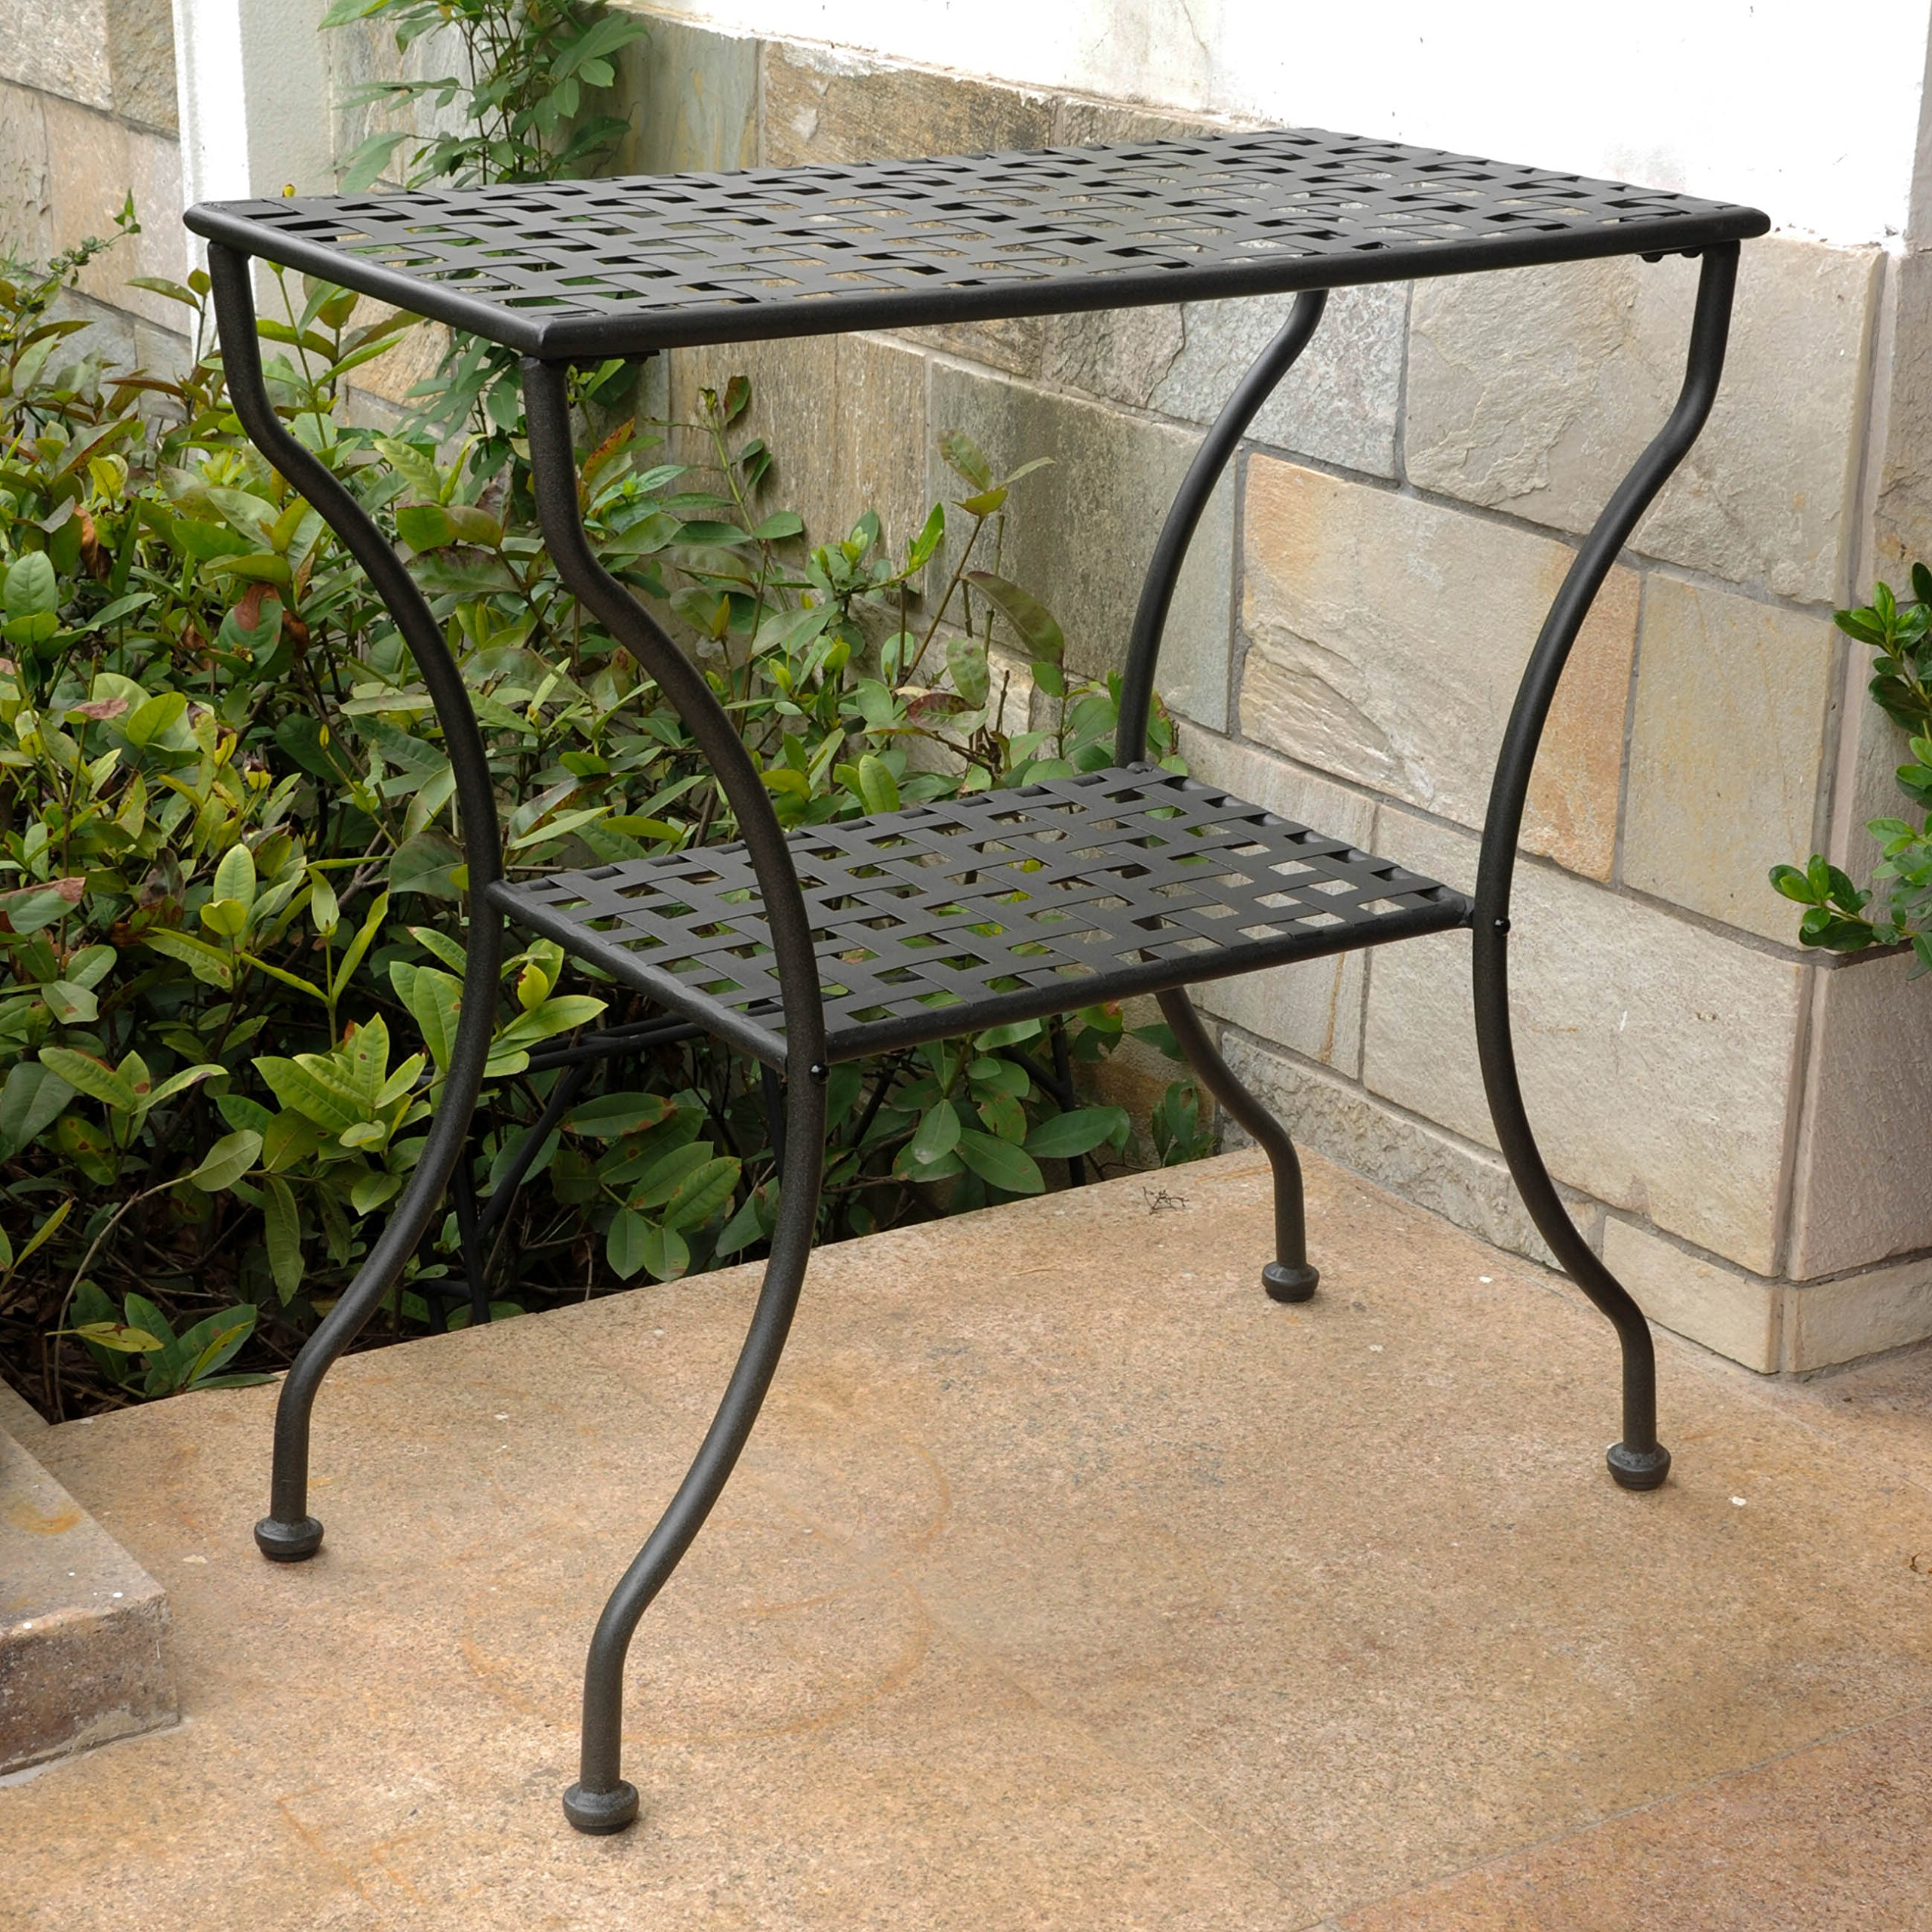 International Caravan 74361 Iron 2-Tier Patio Side Table, Antique Black by International Caravan